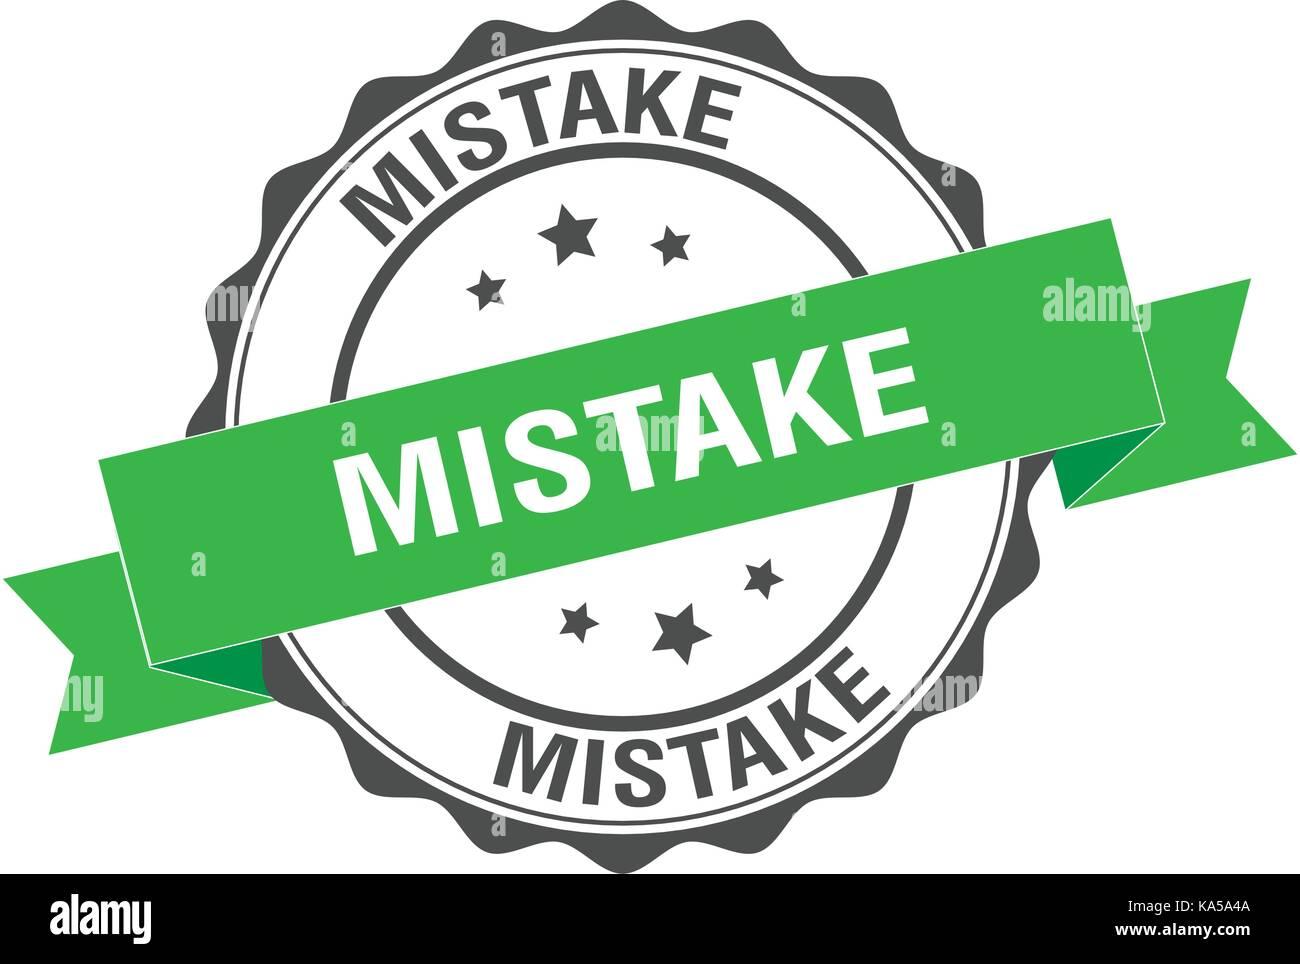 Mistake stamp illustration - Stock Image